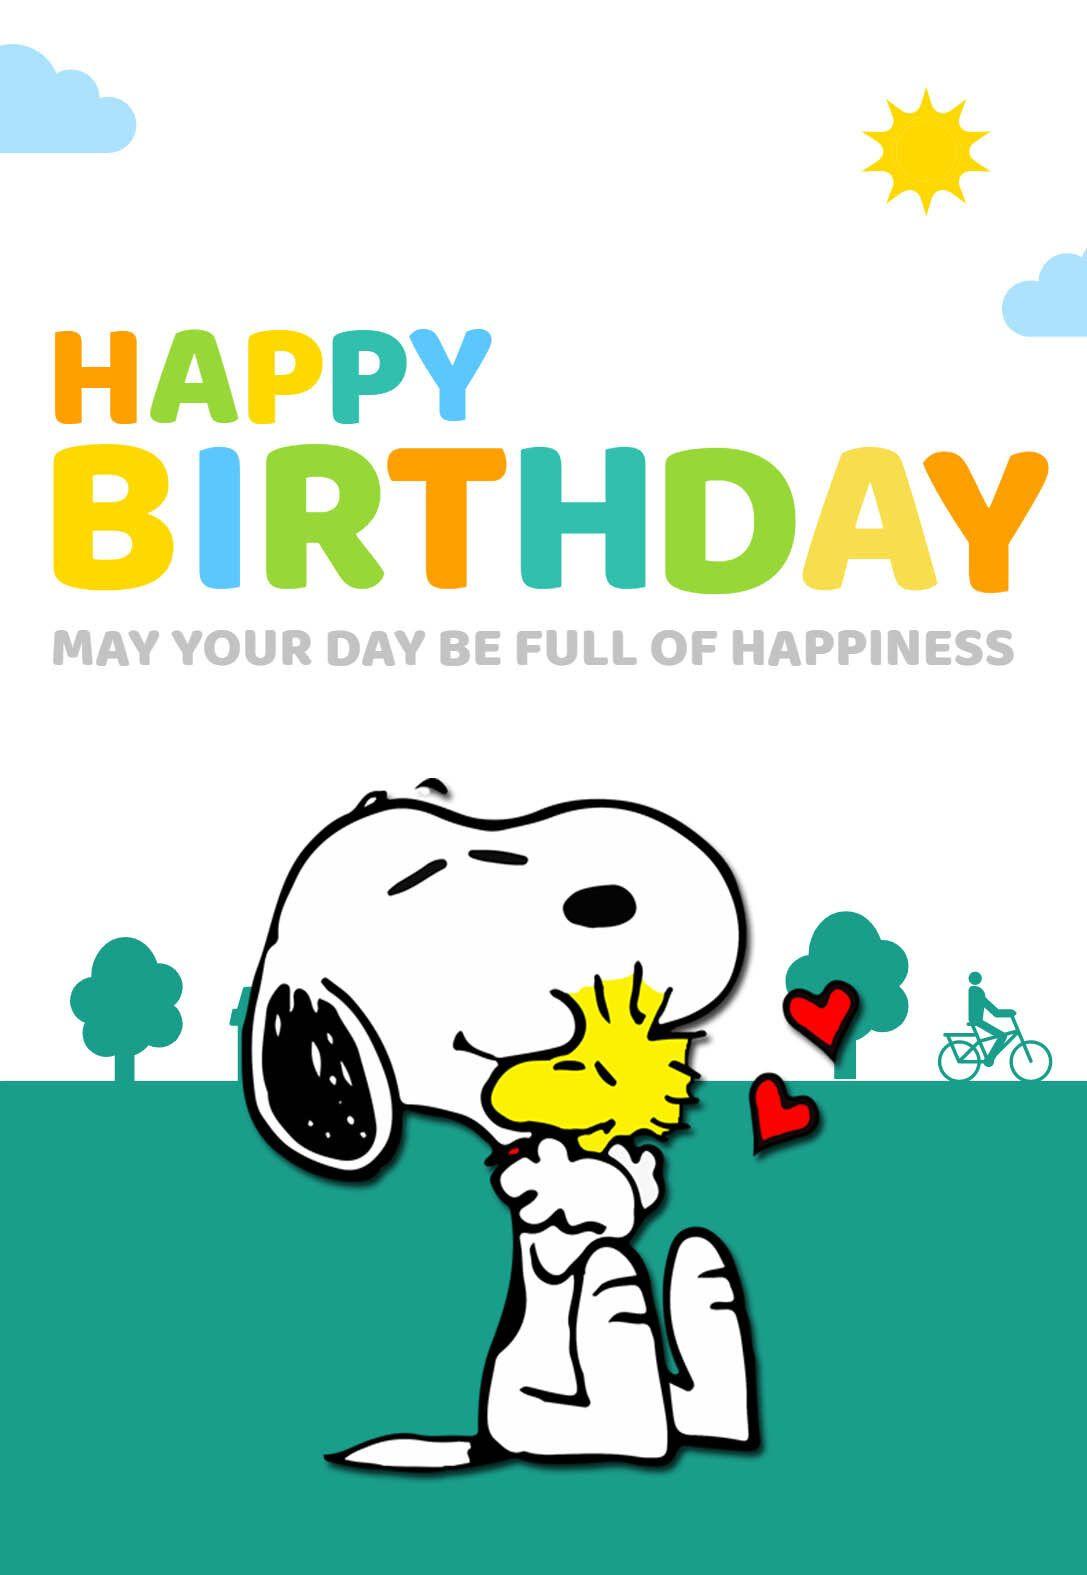 Snoopy Printable Birthday Cards Printbirthday Cards In 2021 Happy Birthday Snoopy Images Snoopy Birthday Snoopy Birthday Quotes